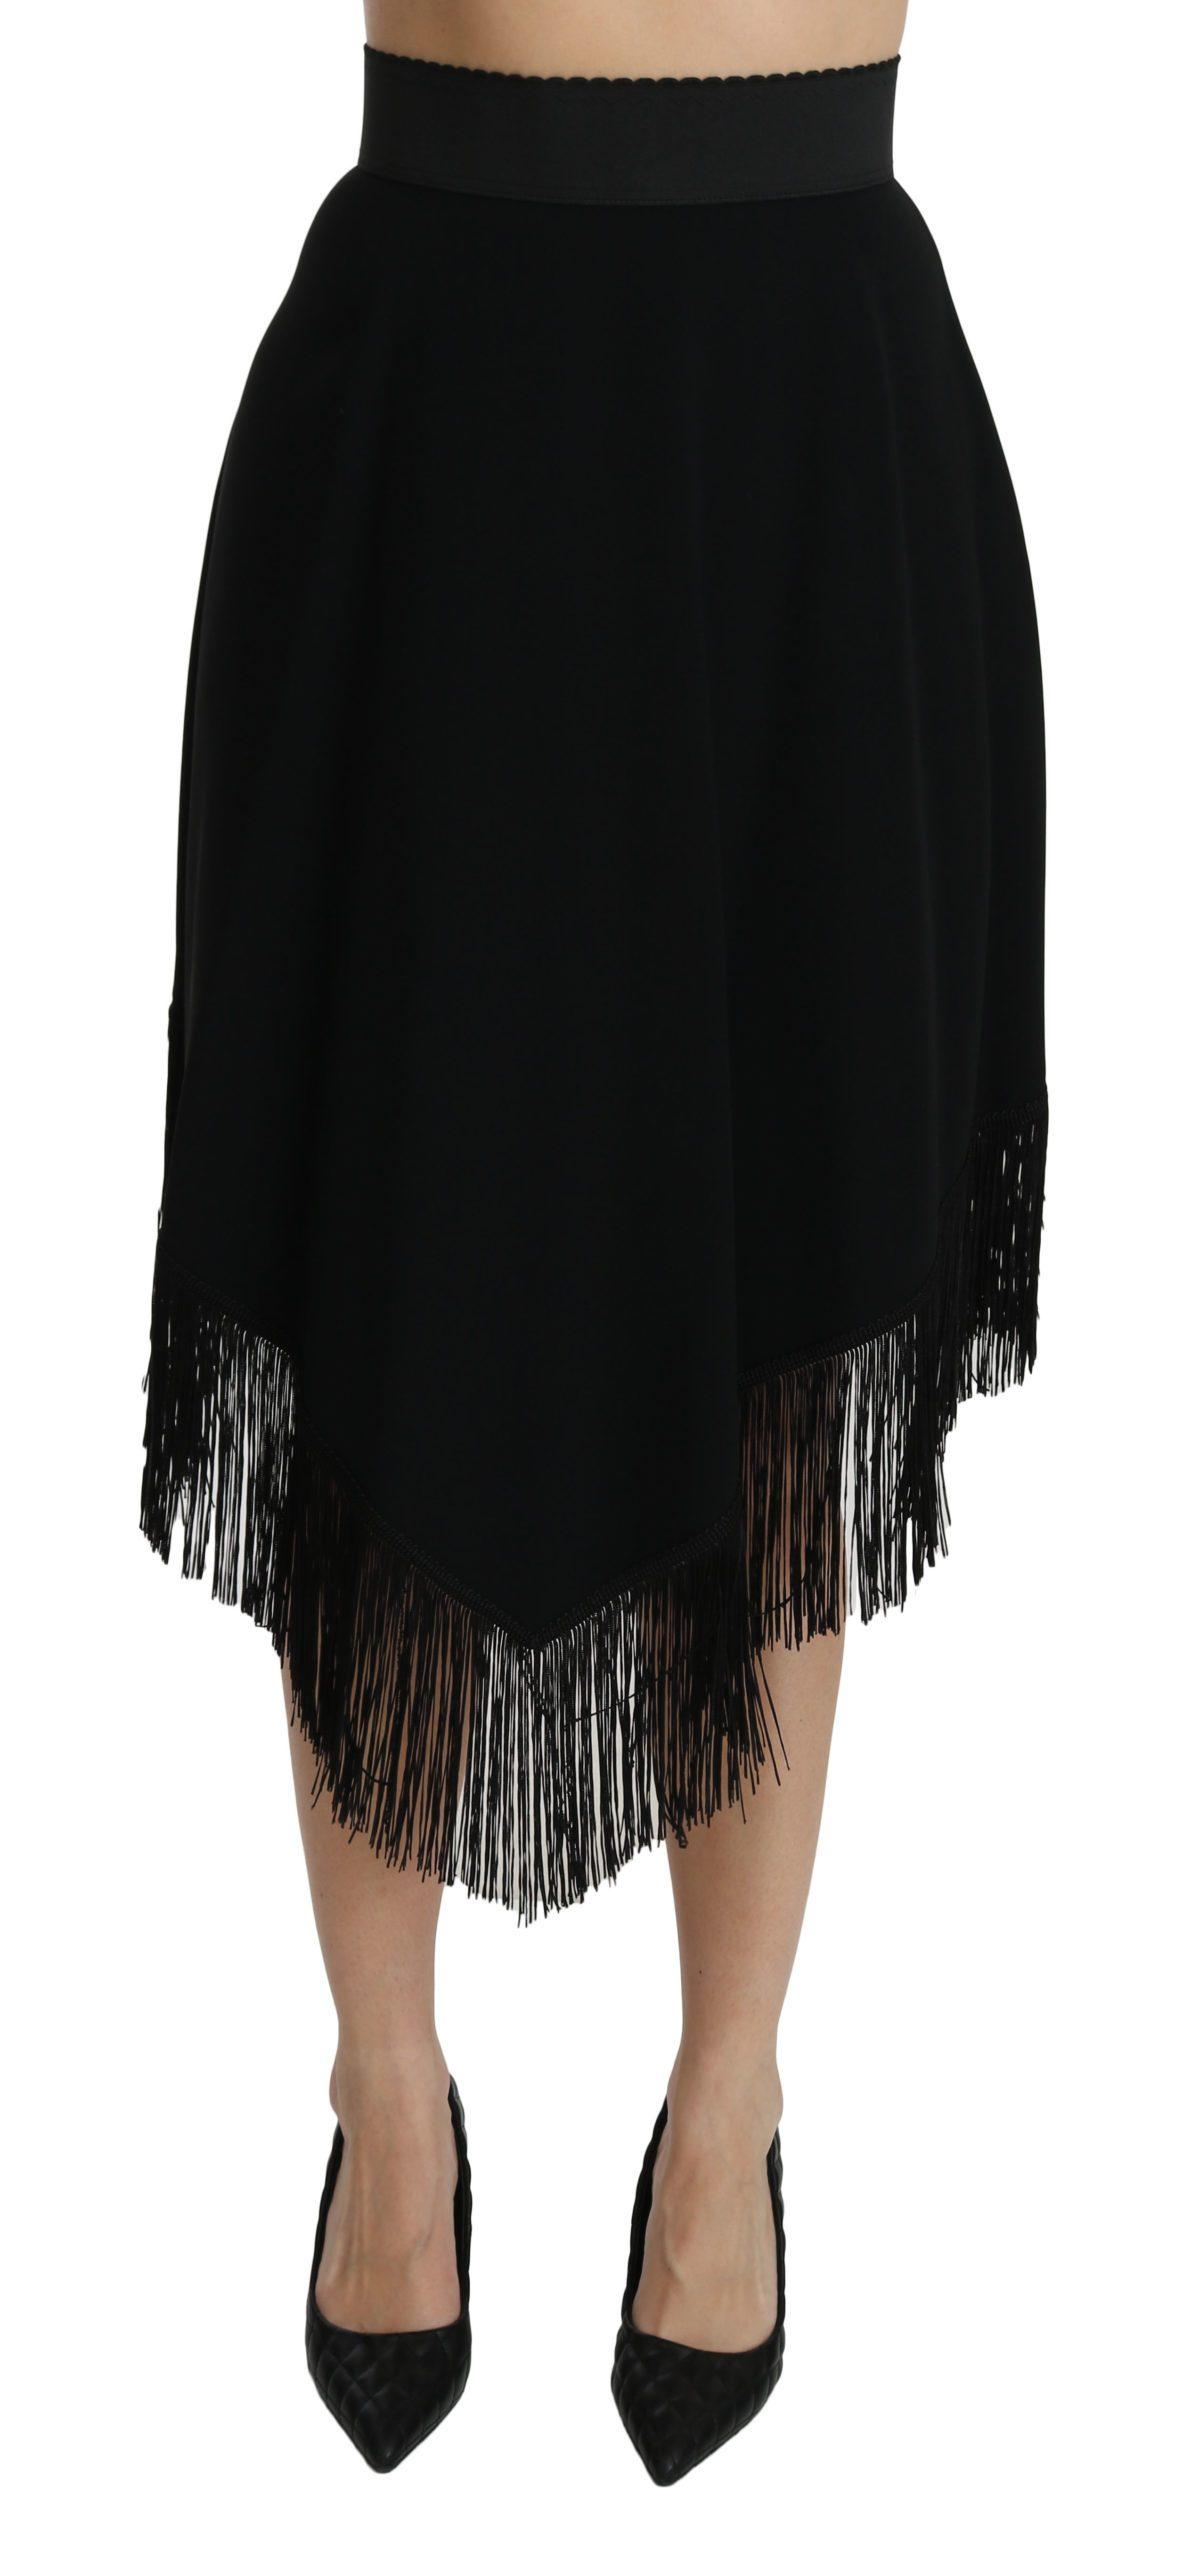 Dolce & Gabbana Women's A-line High Waist Midi Skirt Black SKI1354 - IT46 XL